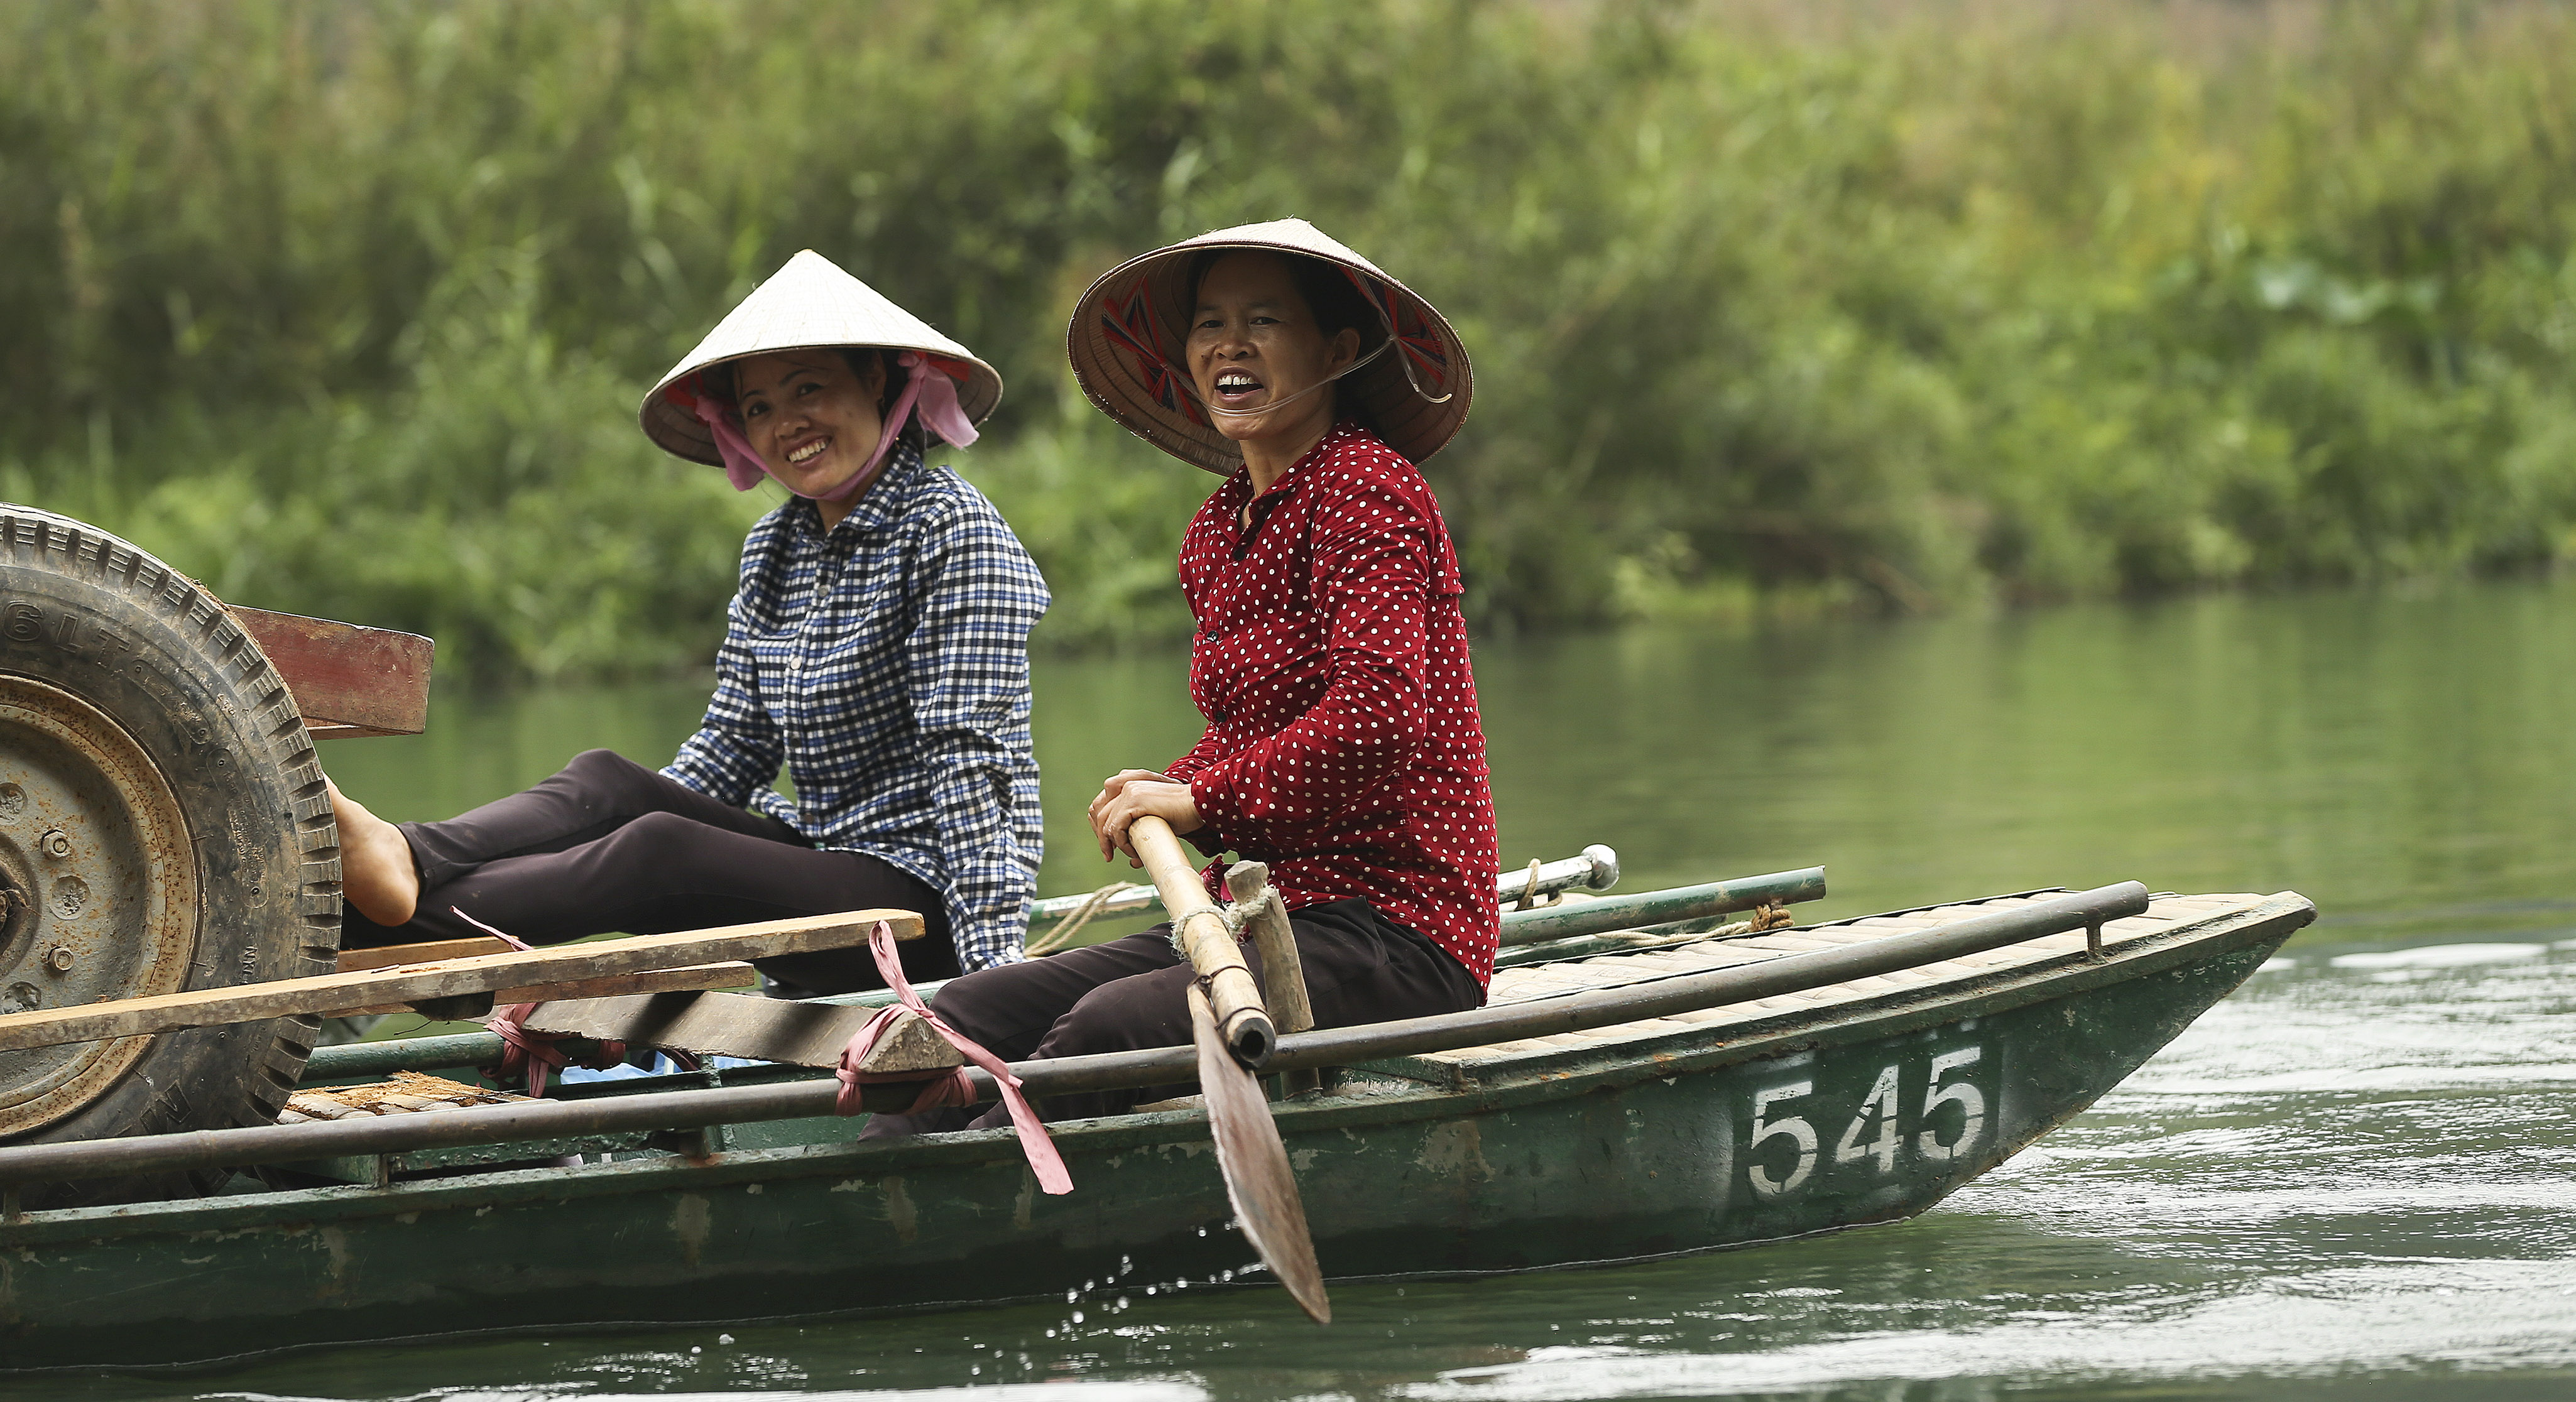 Women smile as they work near the aboriginal village in Trang An, Ninh Binh, Vietnam Apr 23, 2018.